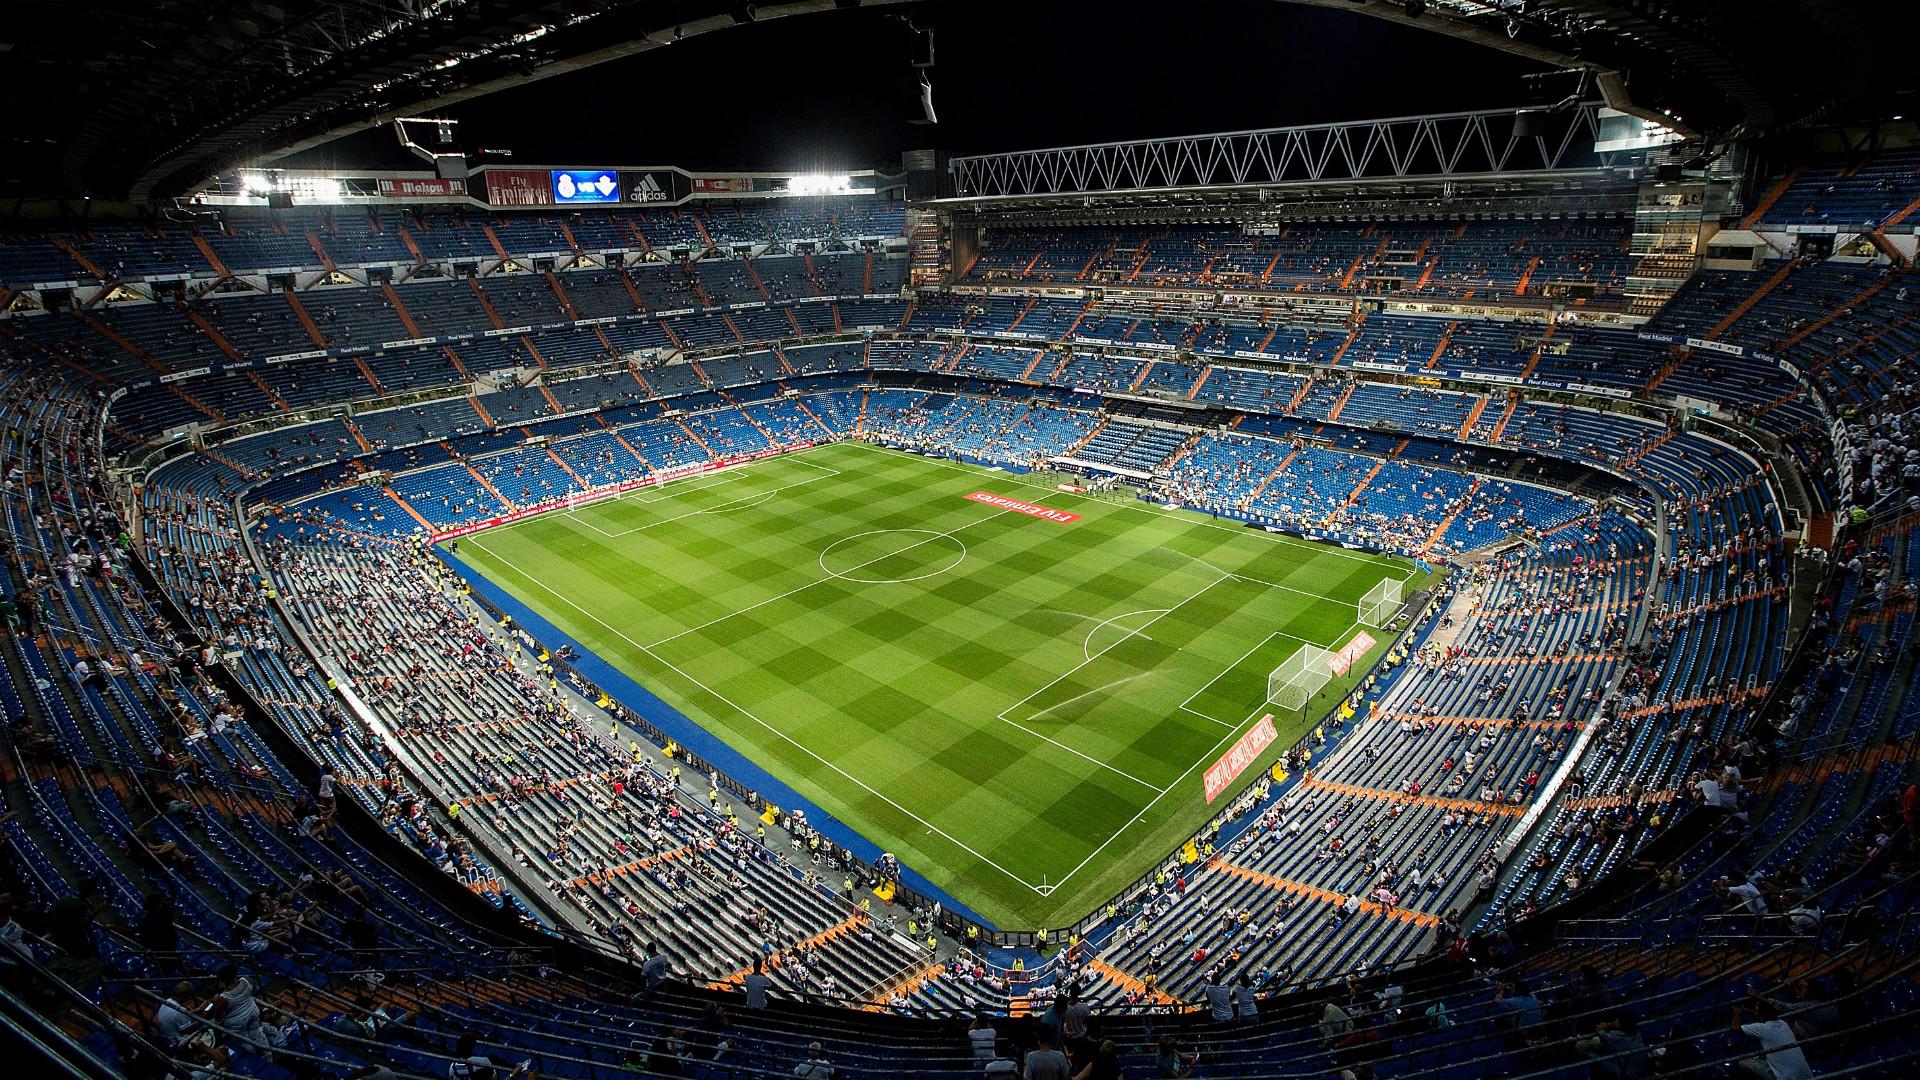 Real Madrid Hd Wallpapers 3d Santiago Bernabeu Wallpapers 68 Images